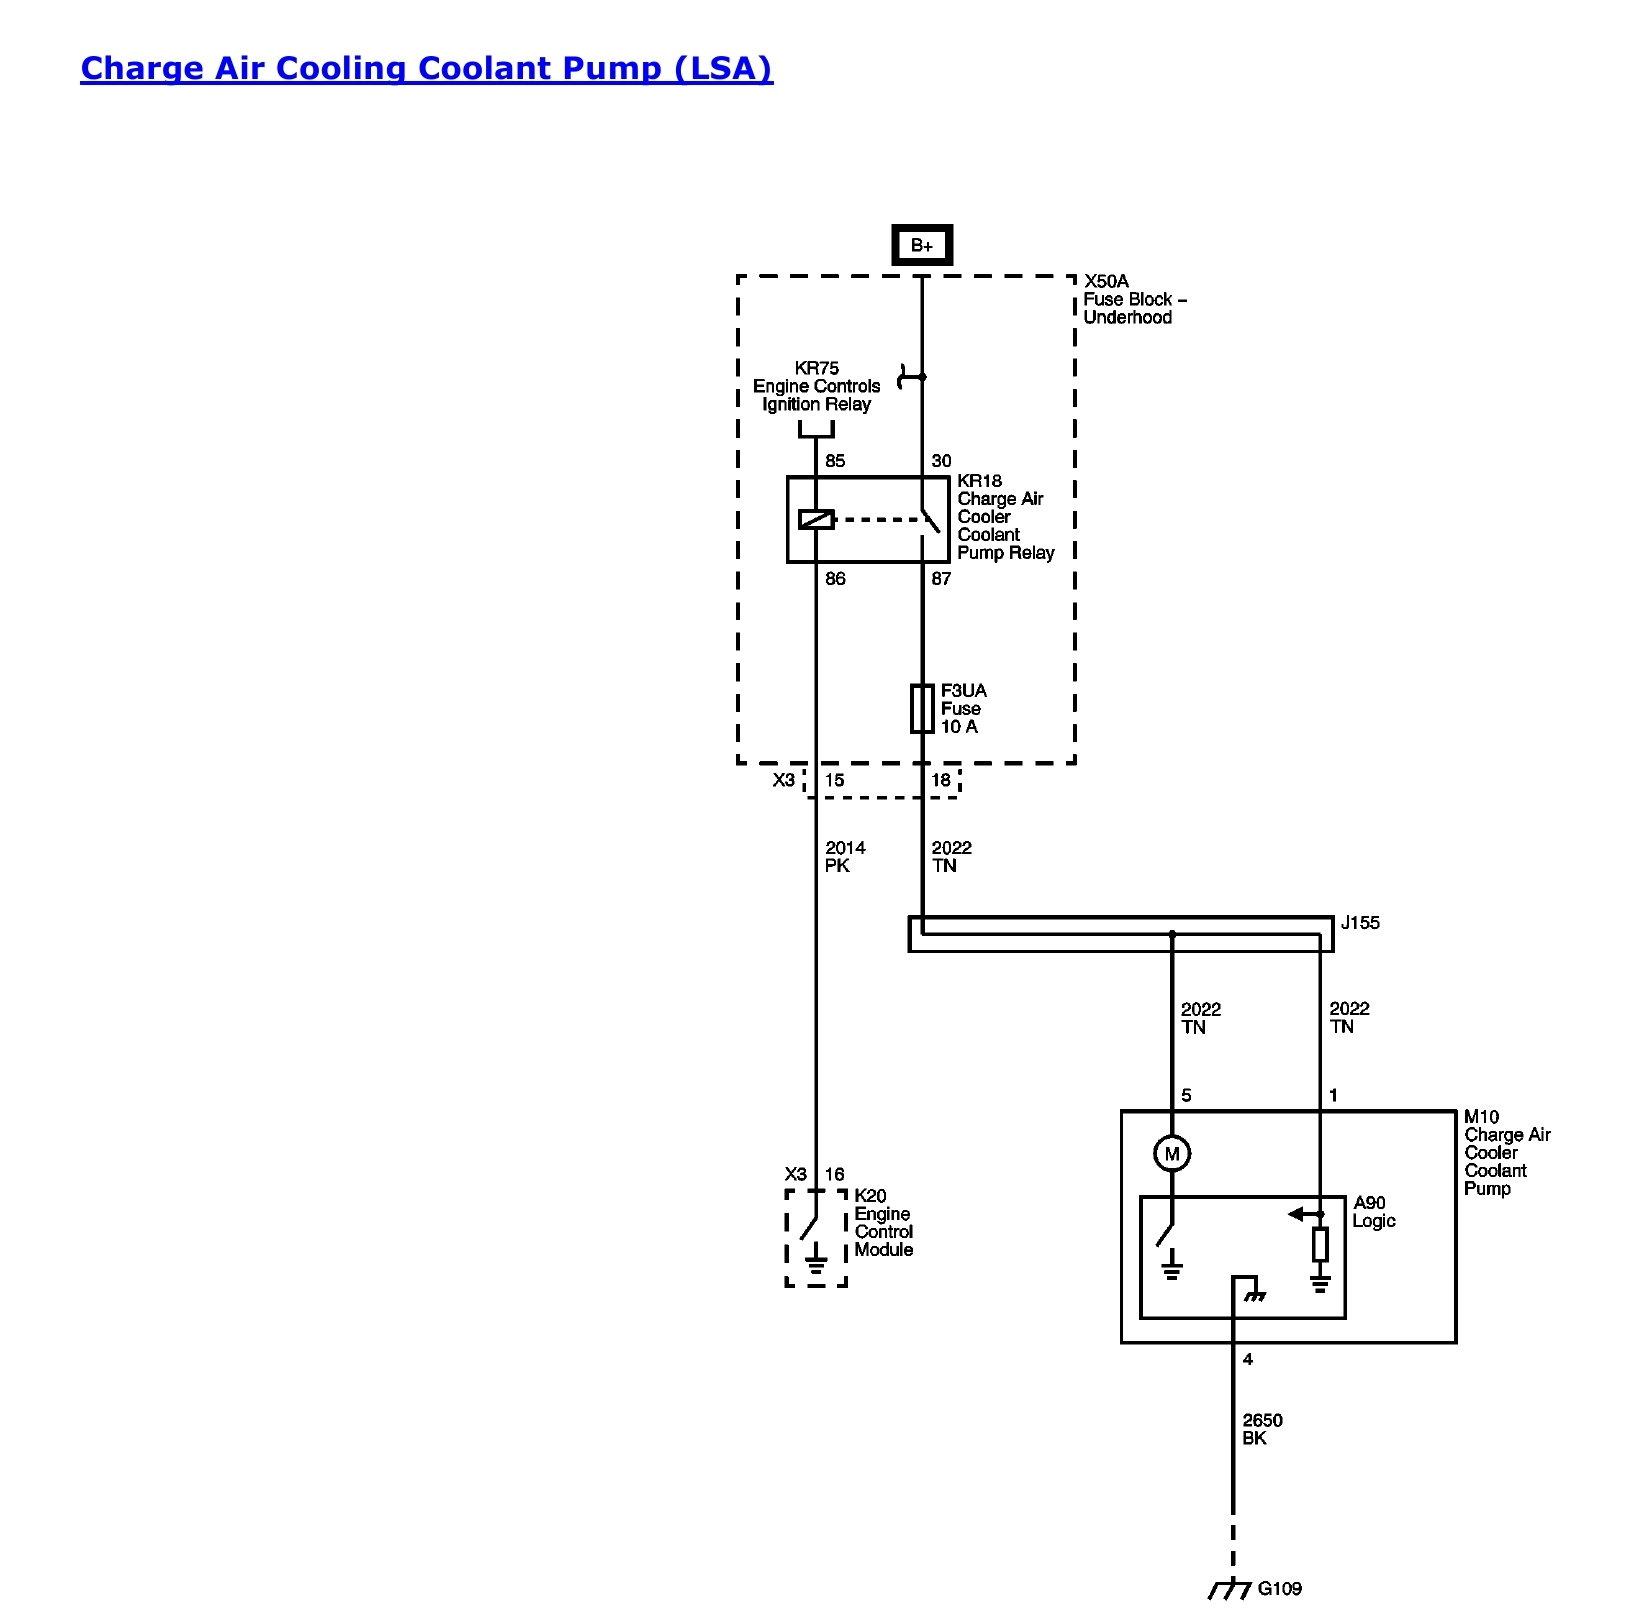 Free Download: Zl1 Wiring Diagram | ePANEL Digital Books on